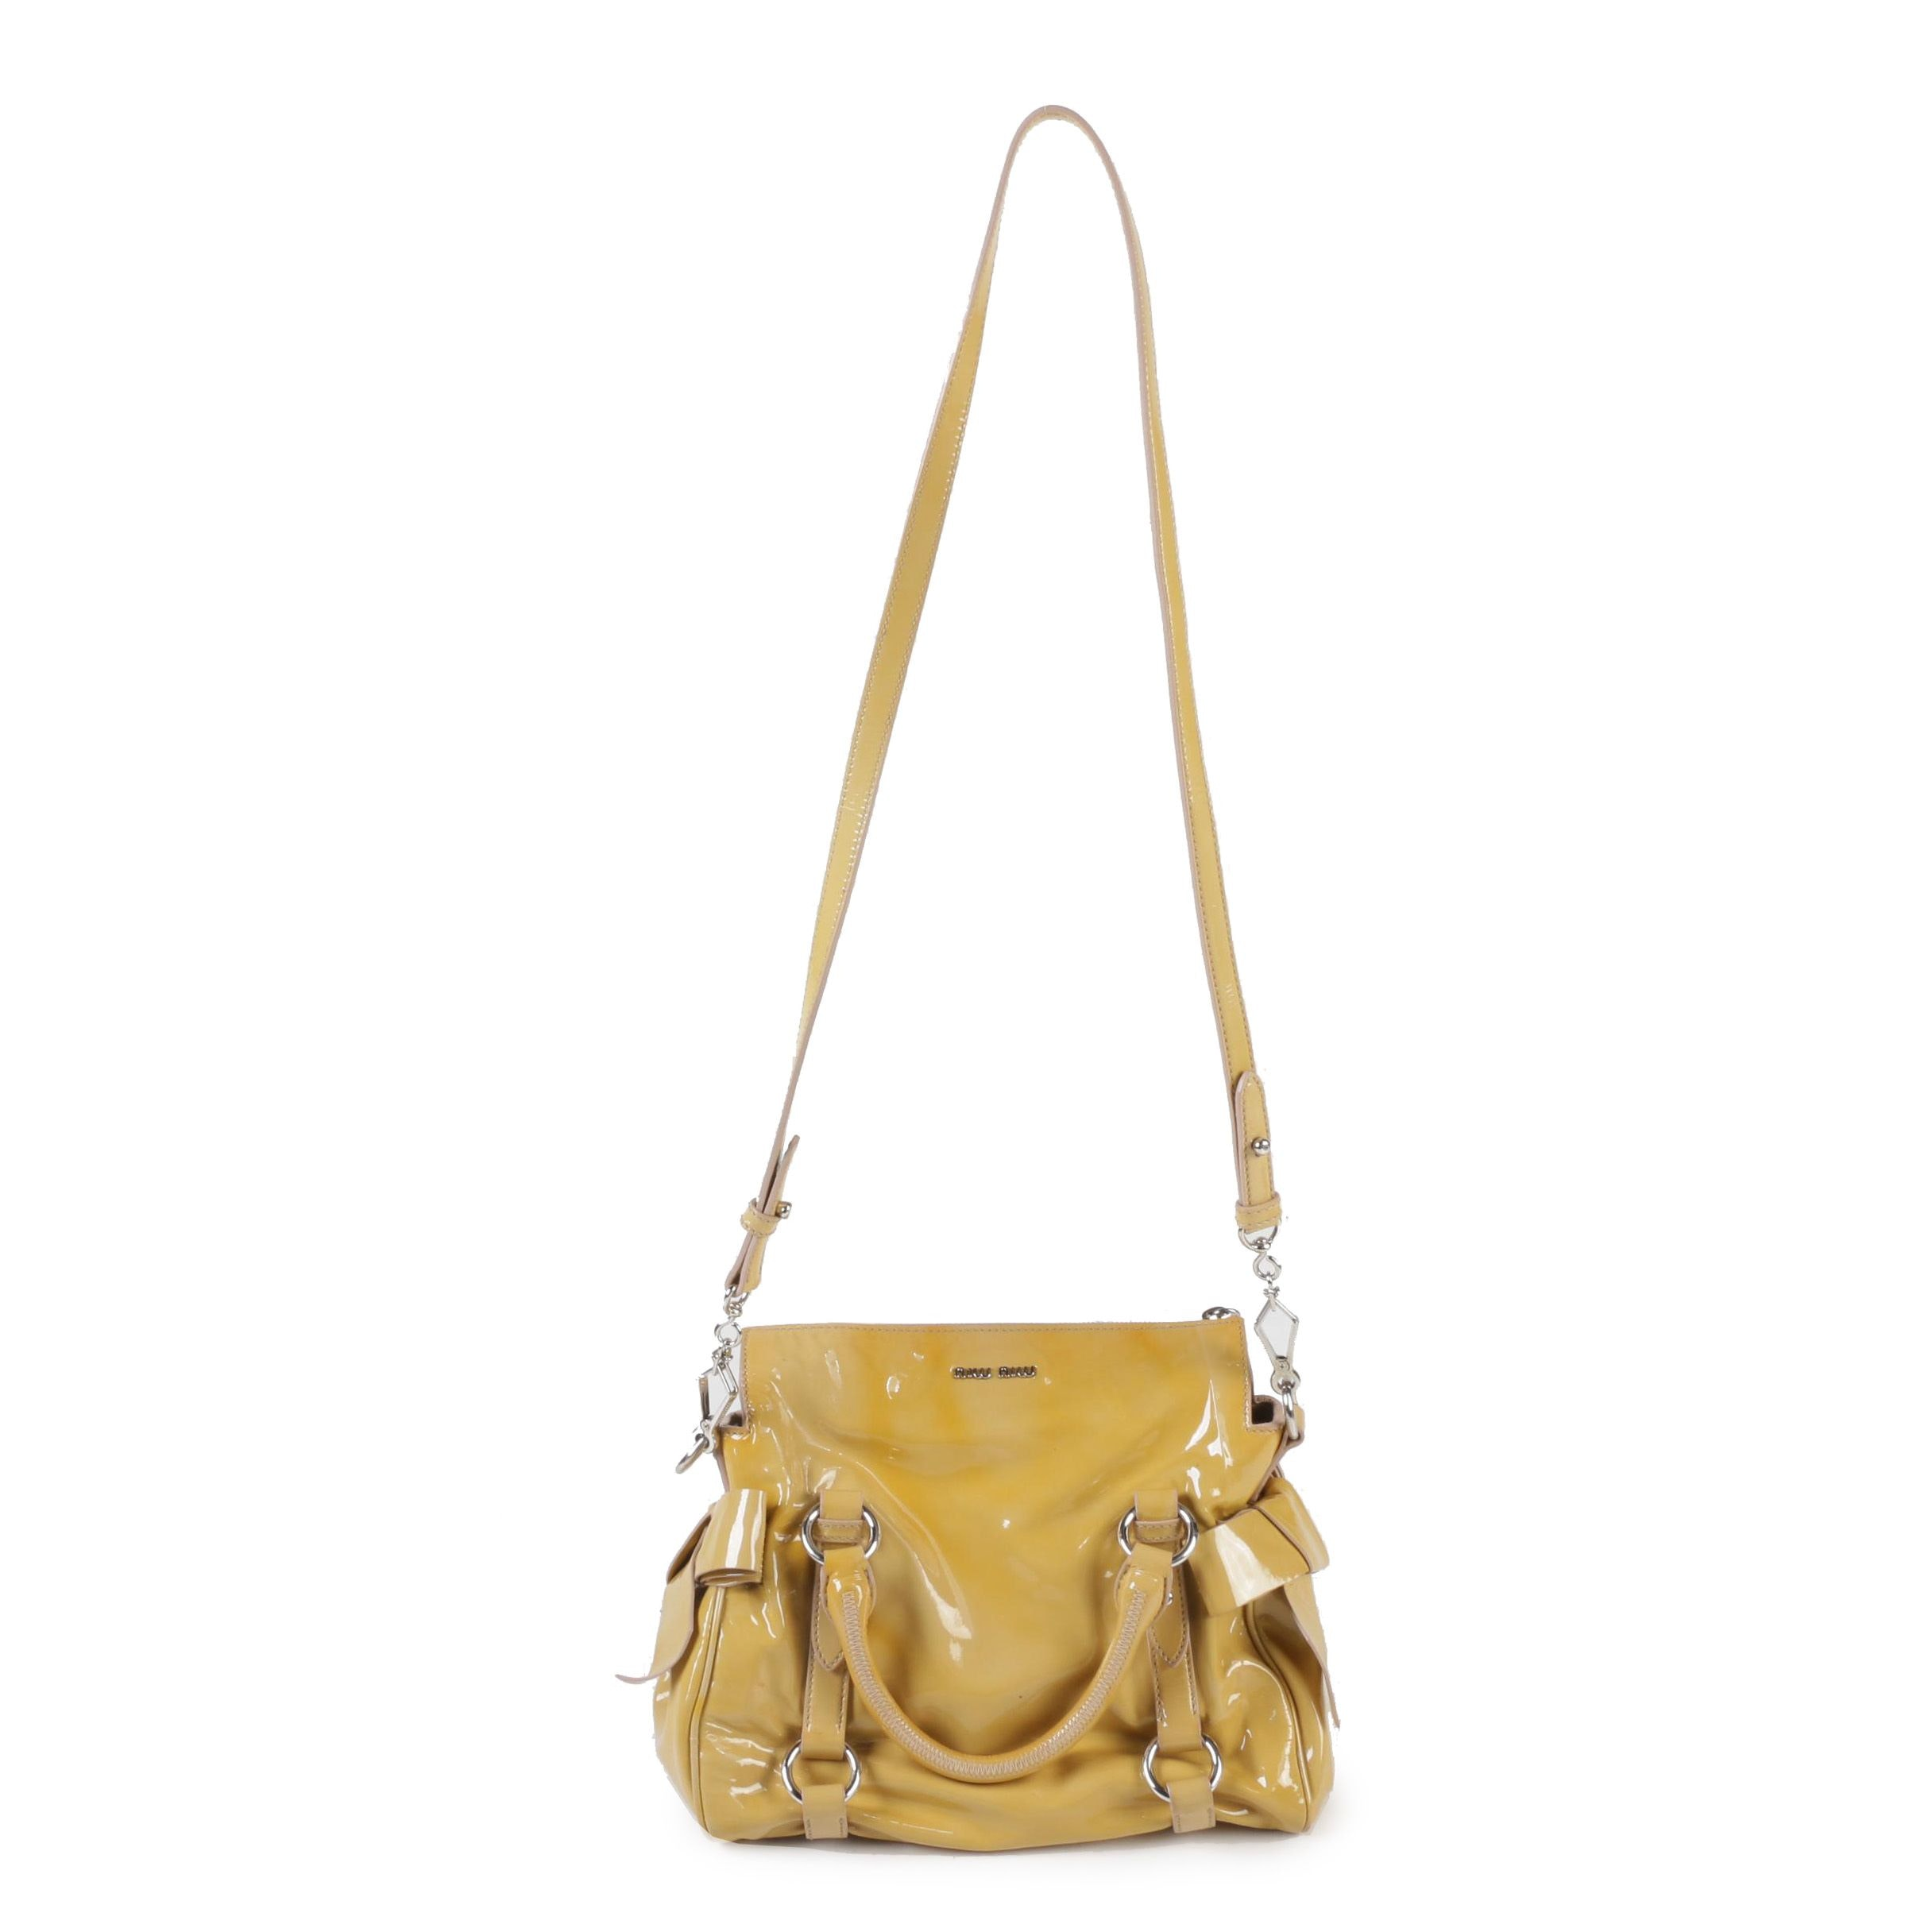 Miu Miu Vitello Lux Patent Leather Bow Handbag with Crossbody Strap